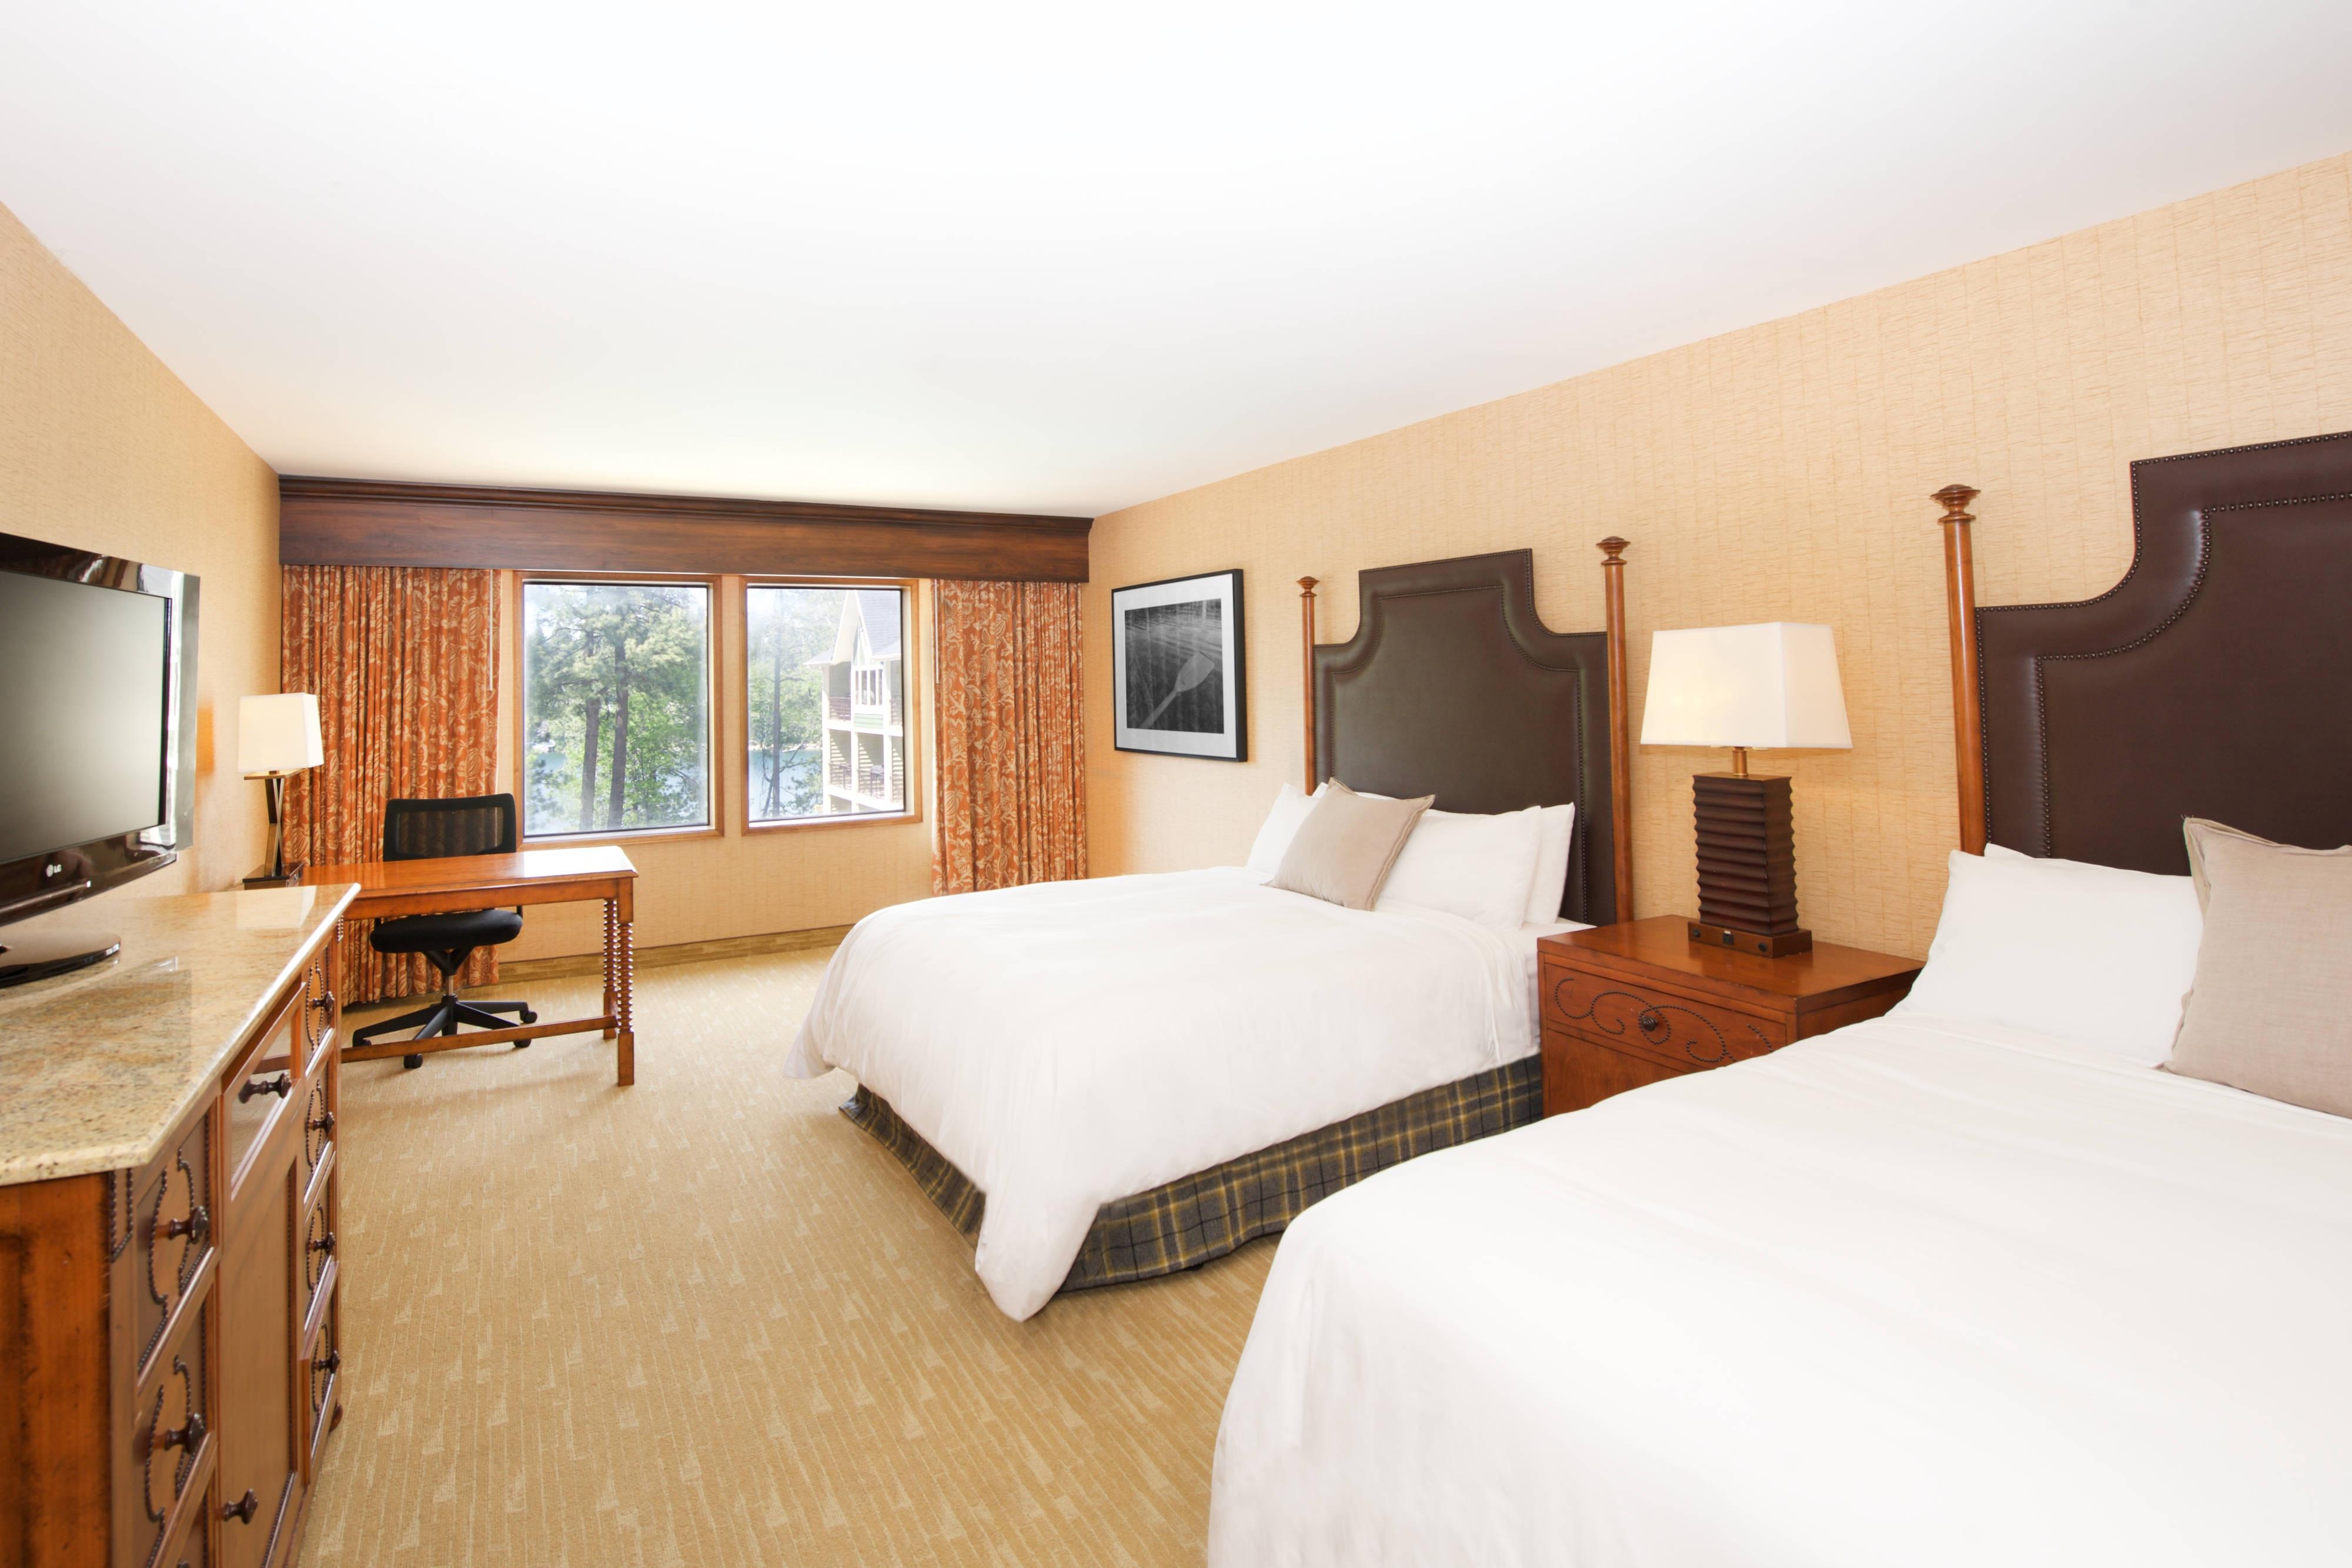 Chambre standard avec deux lits queen size